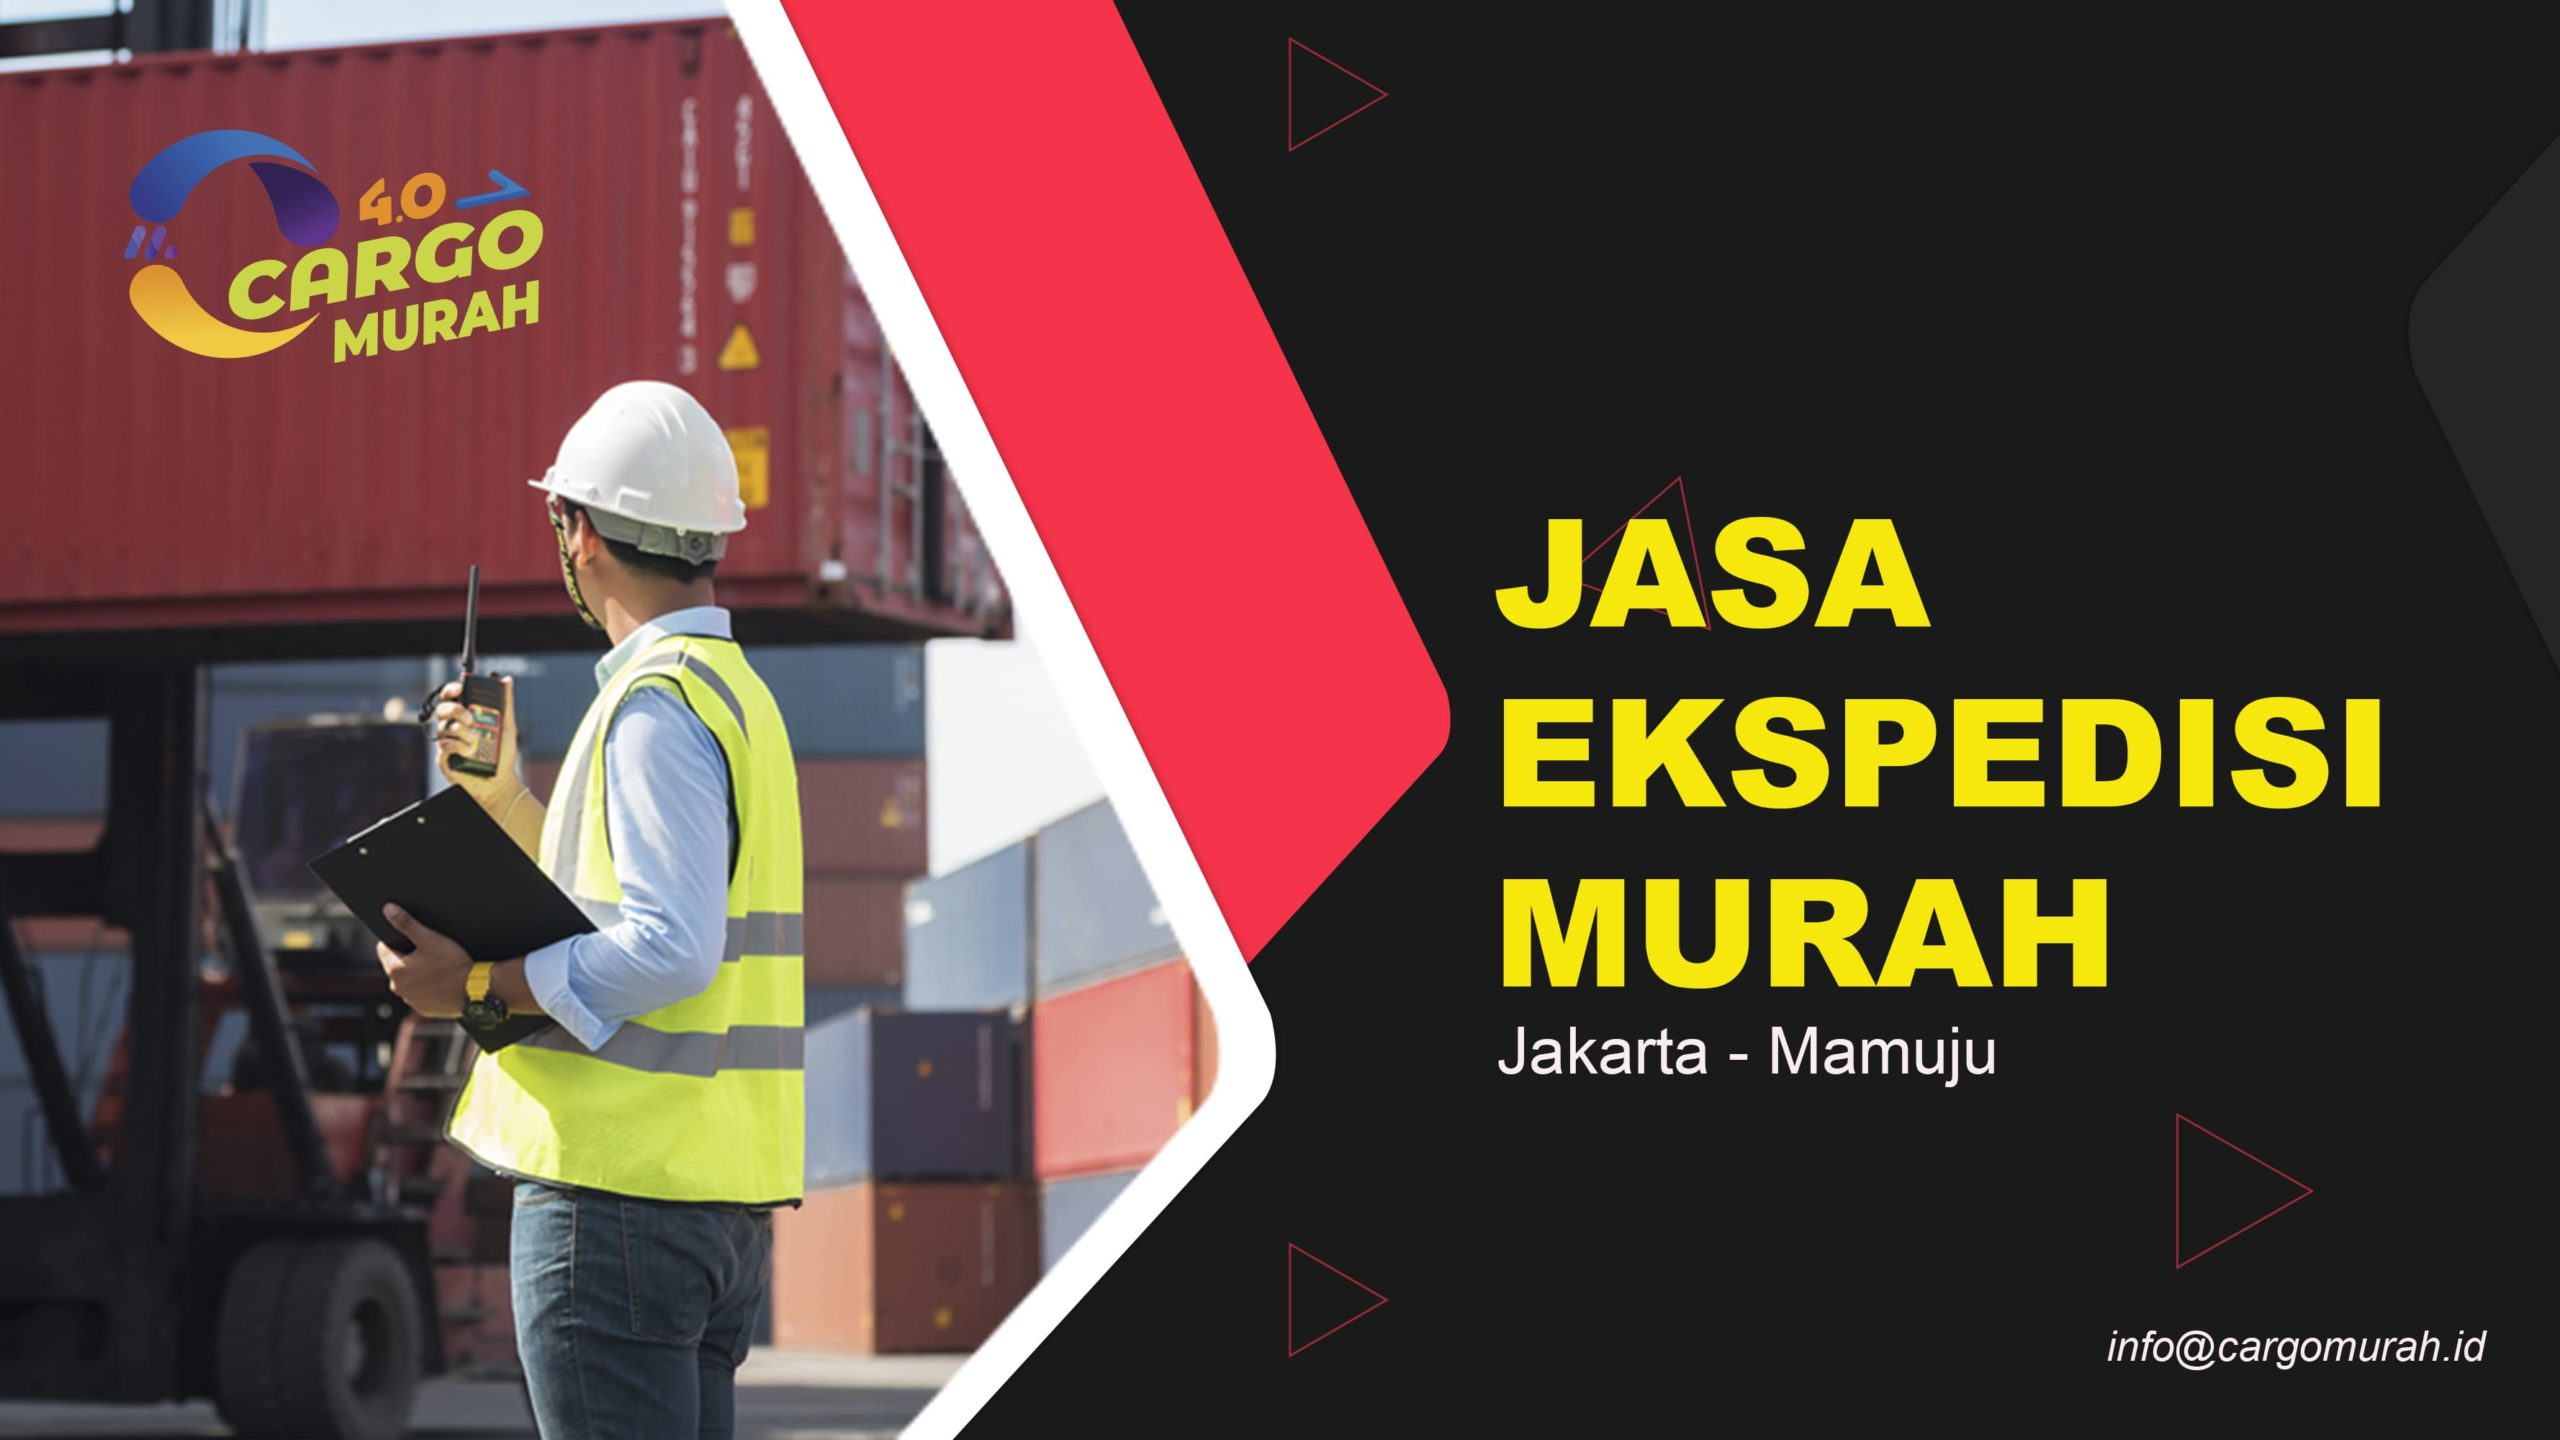 EkspedisiCargo Laut Jakarta Mamuju